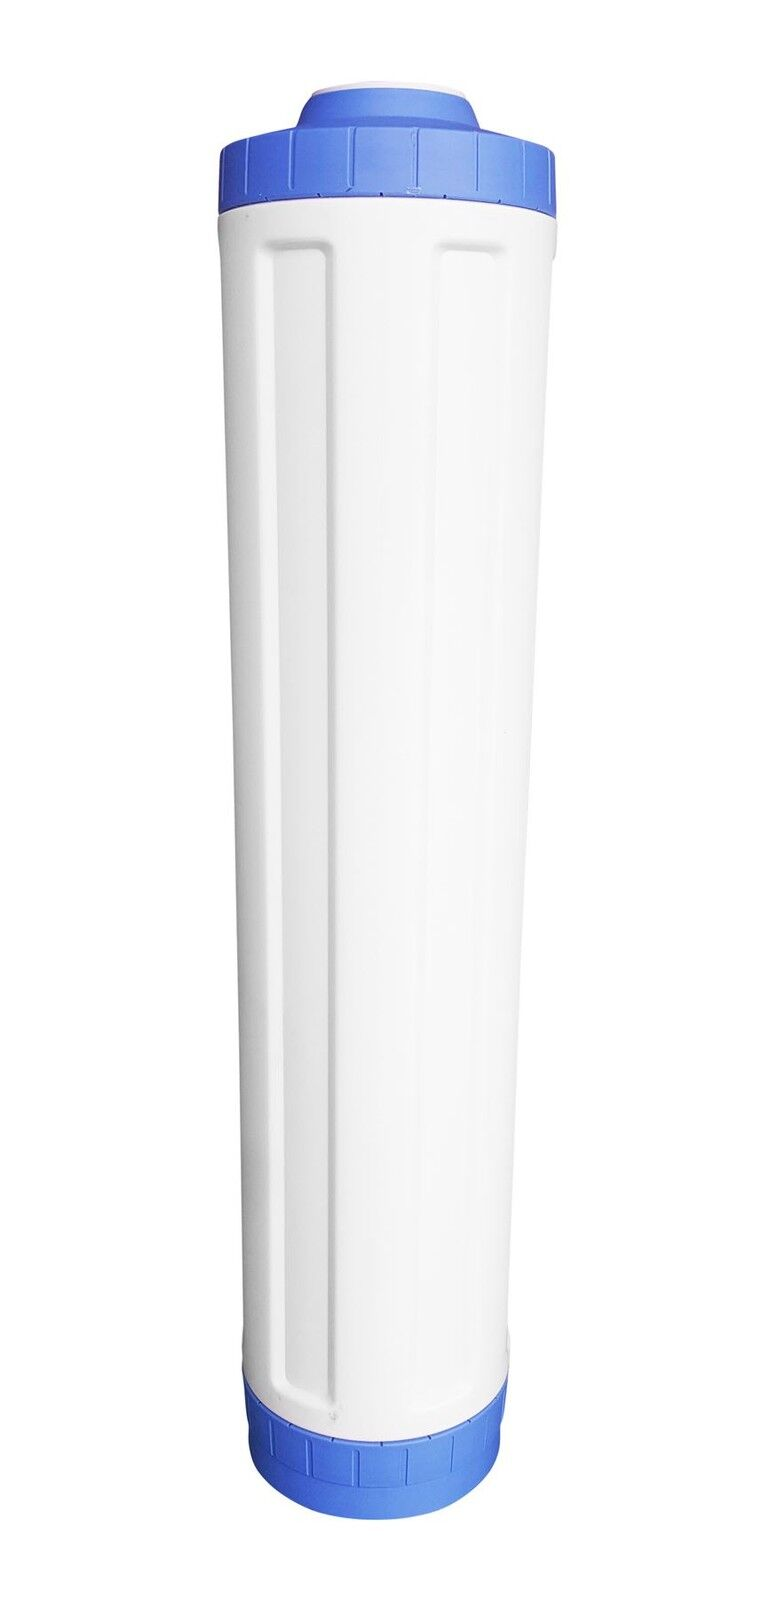 WFMSUPER20BB Yearly Filter for EcoPlus XL Pod 1 - Ceramic Mix Filter Cartridge